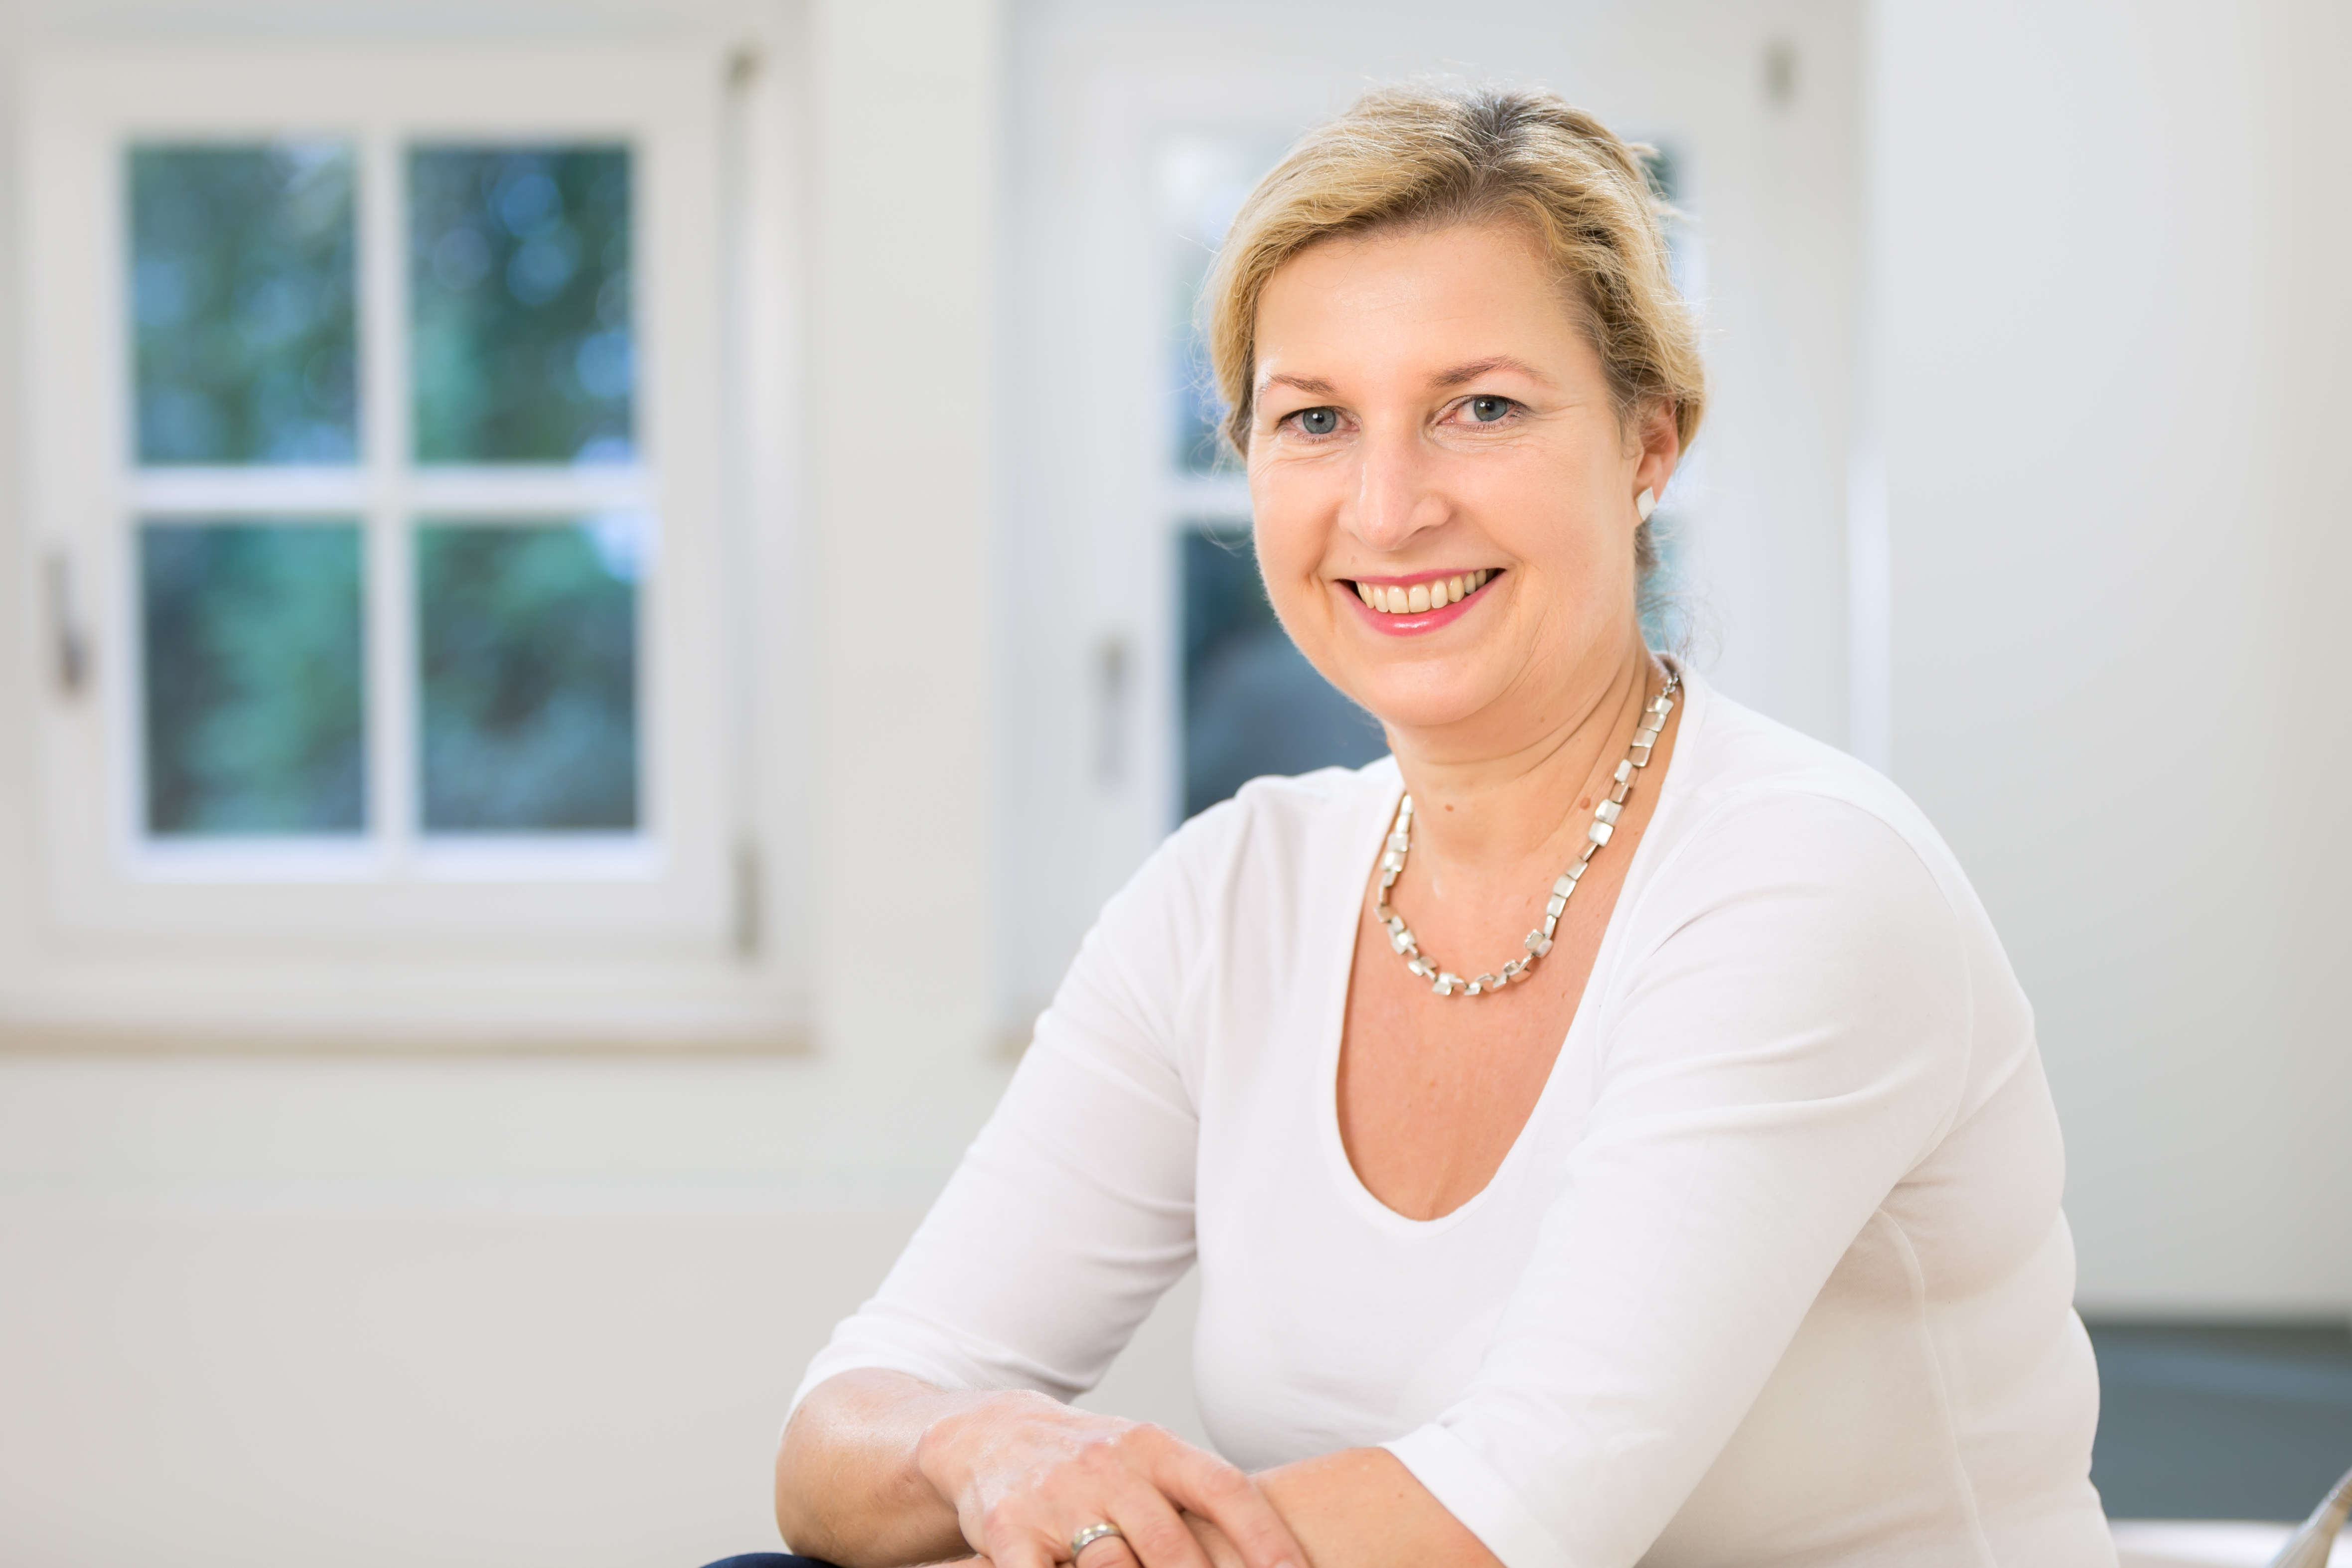 Ulrike Steinecke